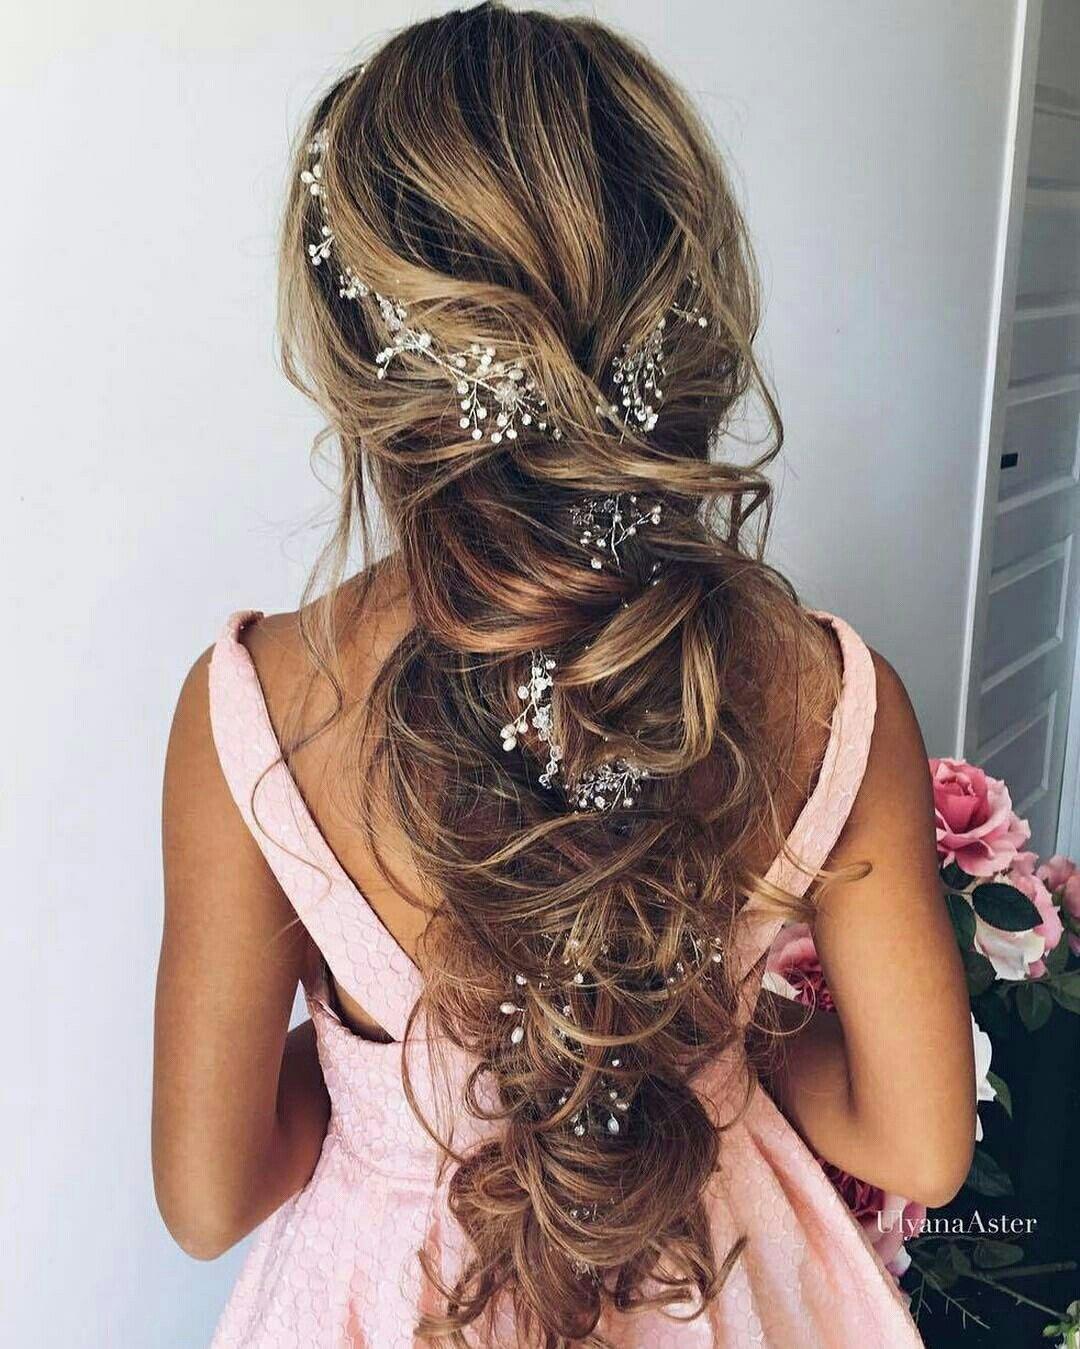 Gorgeous Wedding Hairstyles Maggiesottero Mylovestory Showyourcoast Coastdiamond Long Bridal Hair Long Hair Wedding Styles Long Hair Styles